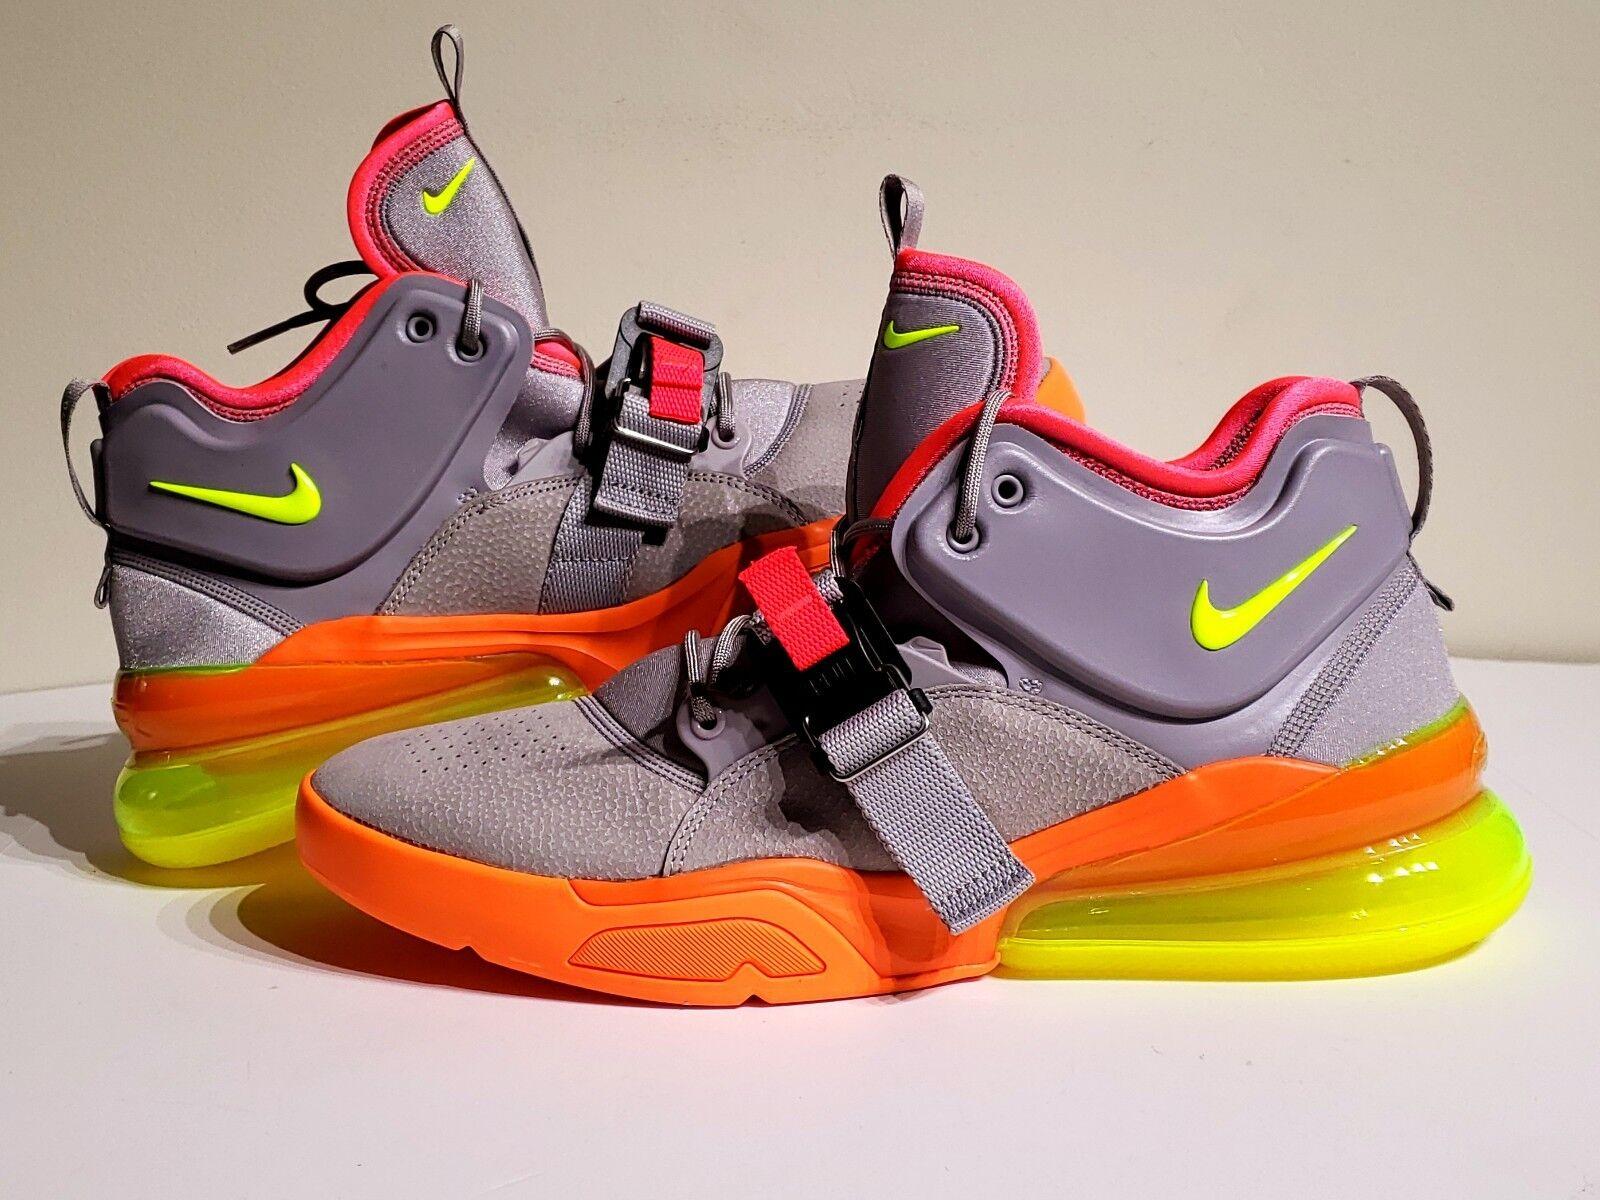 Nike Air Force 270 Barkley Sherbert Grey Volt orange AH6772-007 Mens Size 9